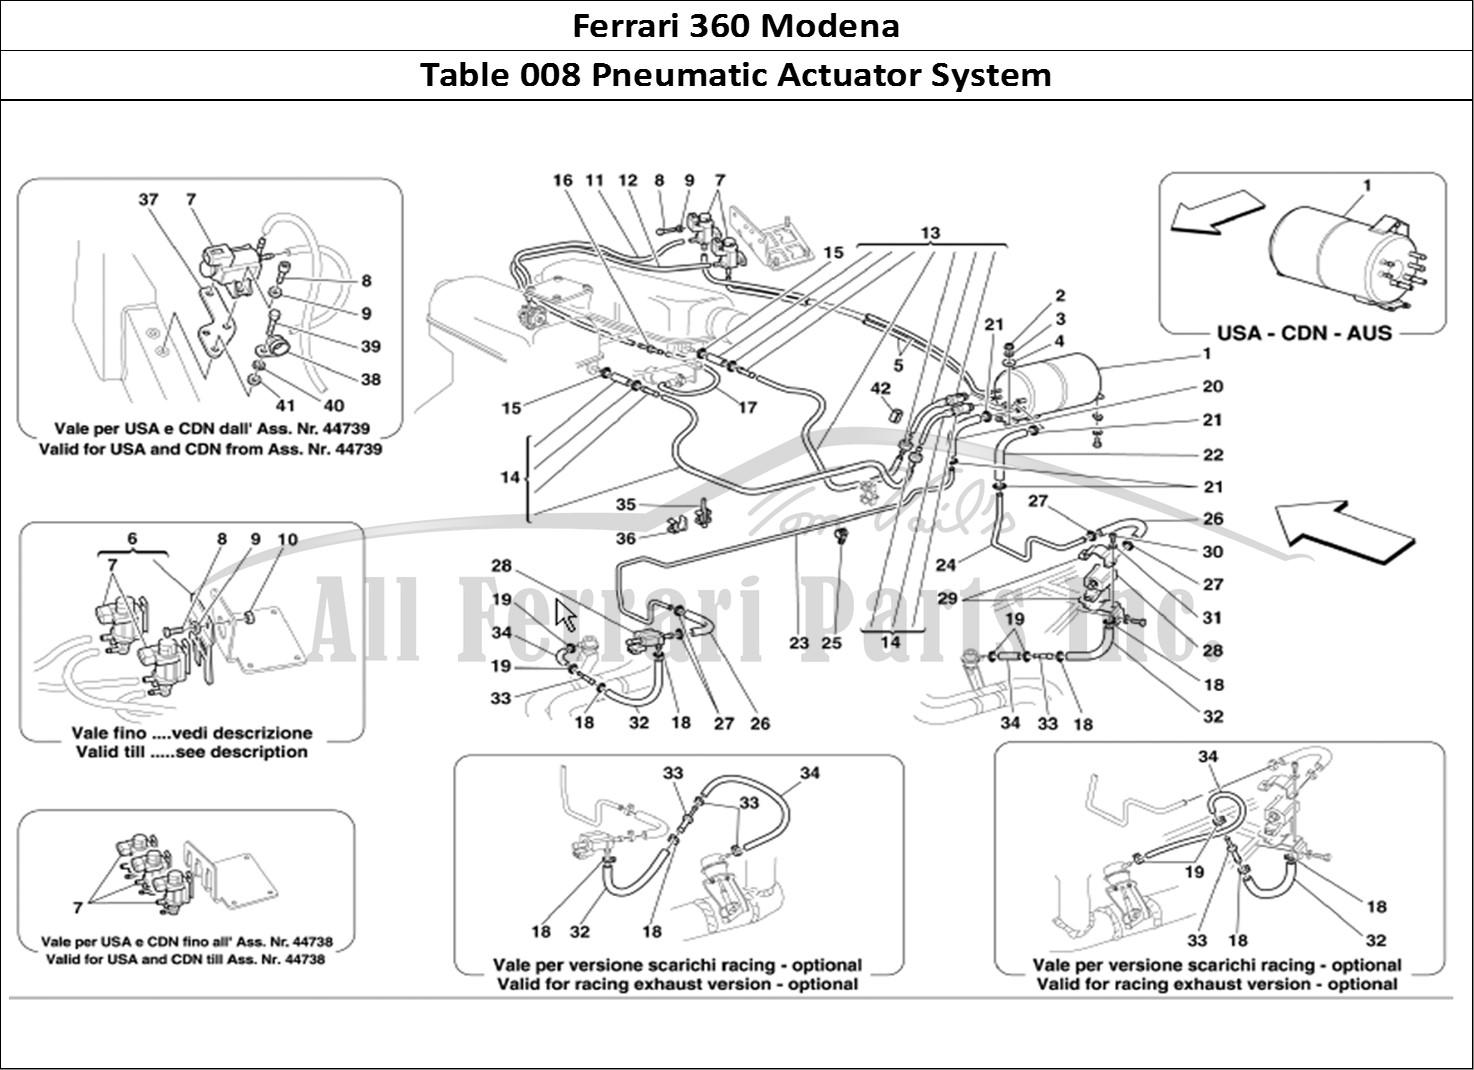 hight resolution of ferrari 360 modena mechanical table 008 pneumatic actuator system